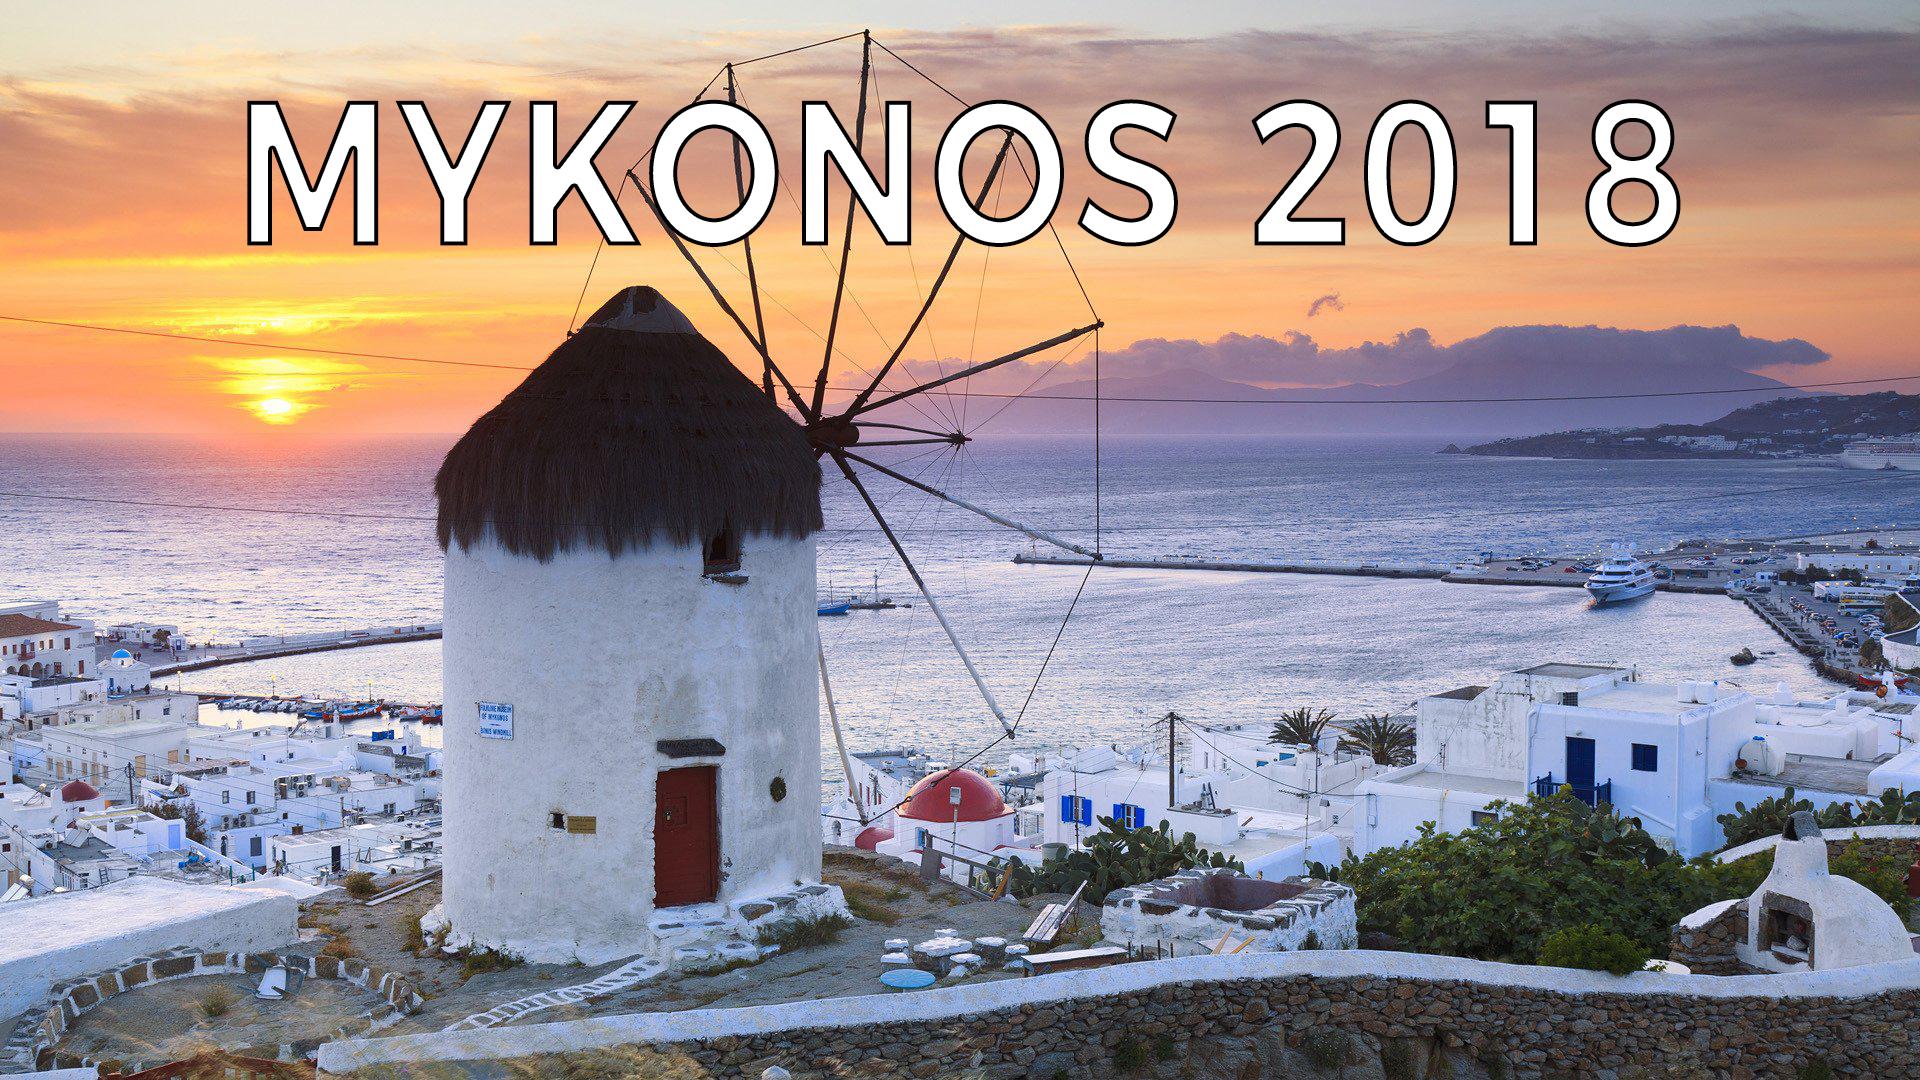 Consigli utili per Mykonos